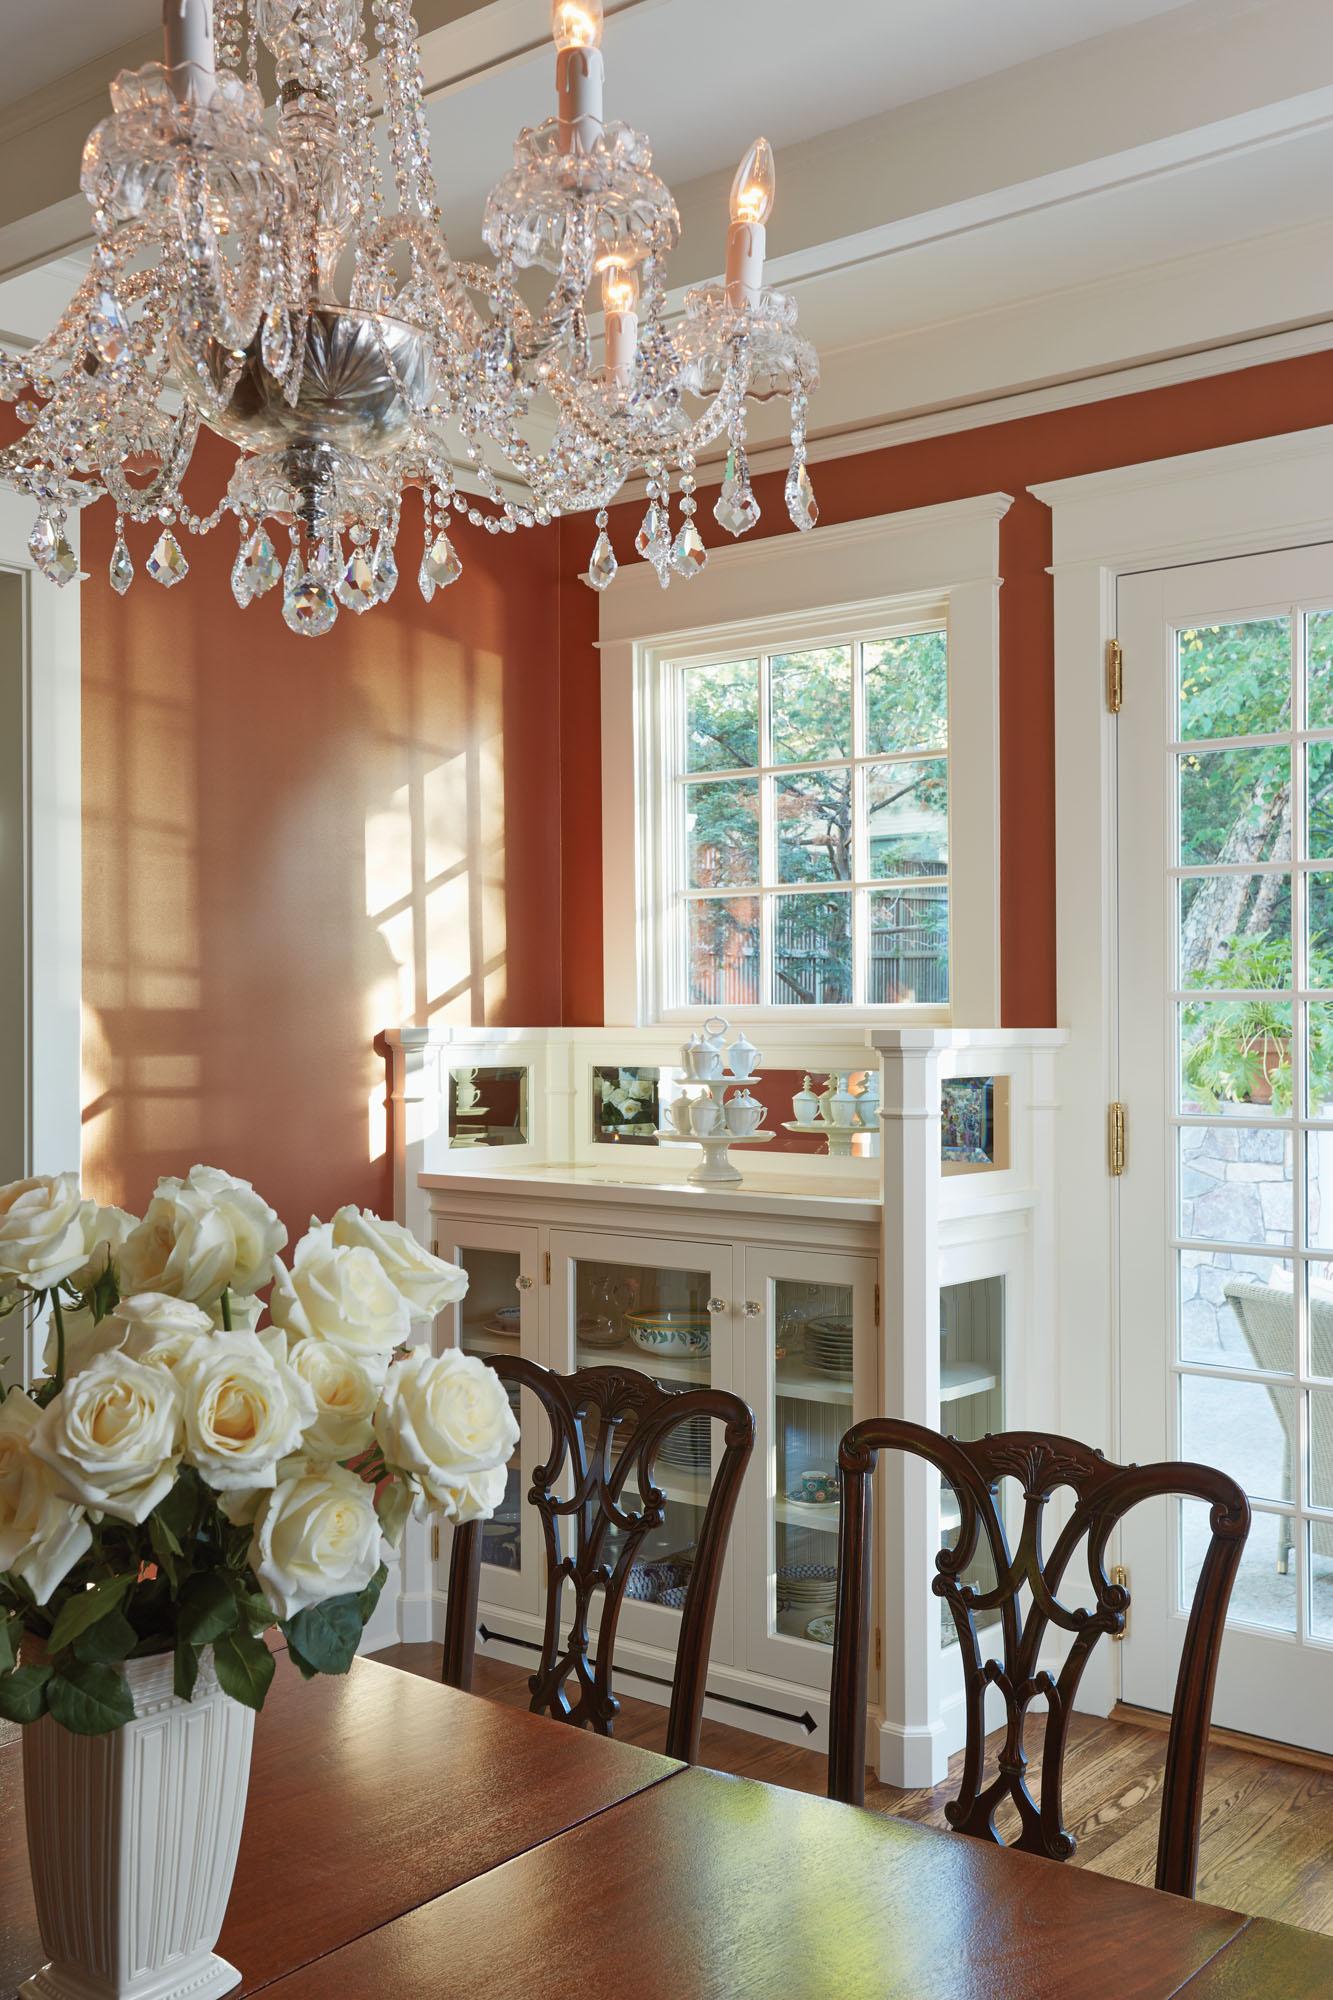 ARts & Crafts dining room by David Heide Design